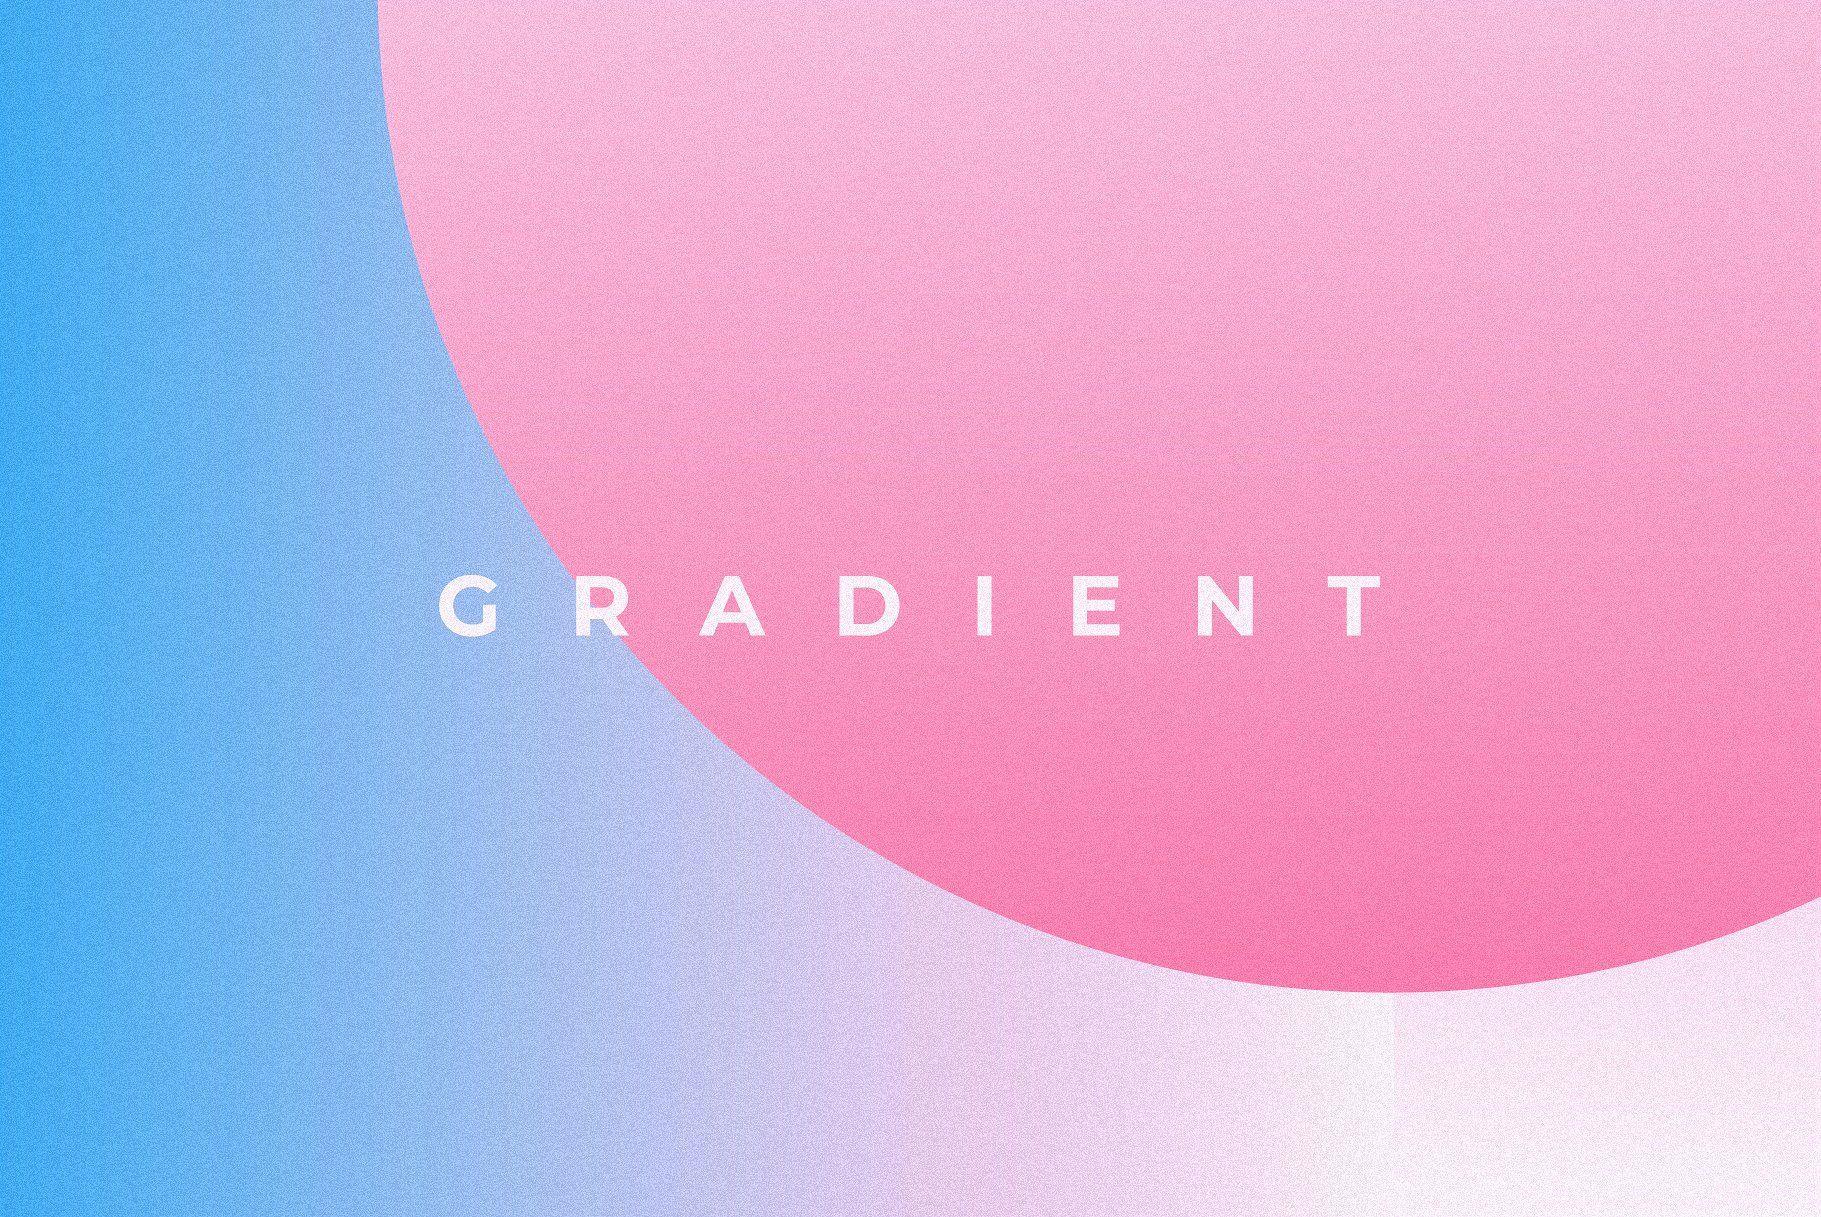 59 Geometric Gradient Backgrounds Graphic Design Pattern Gradient Background Geometric